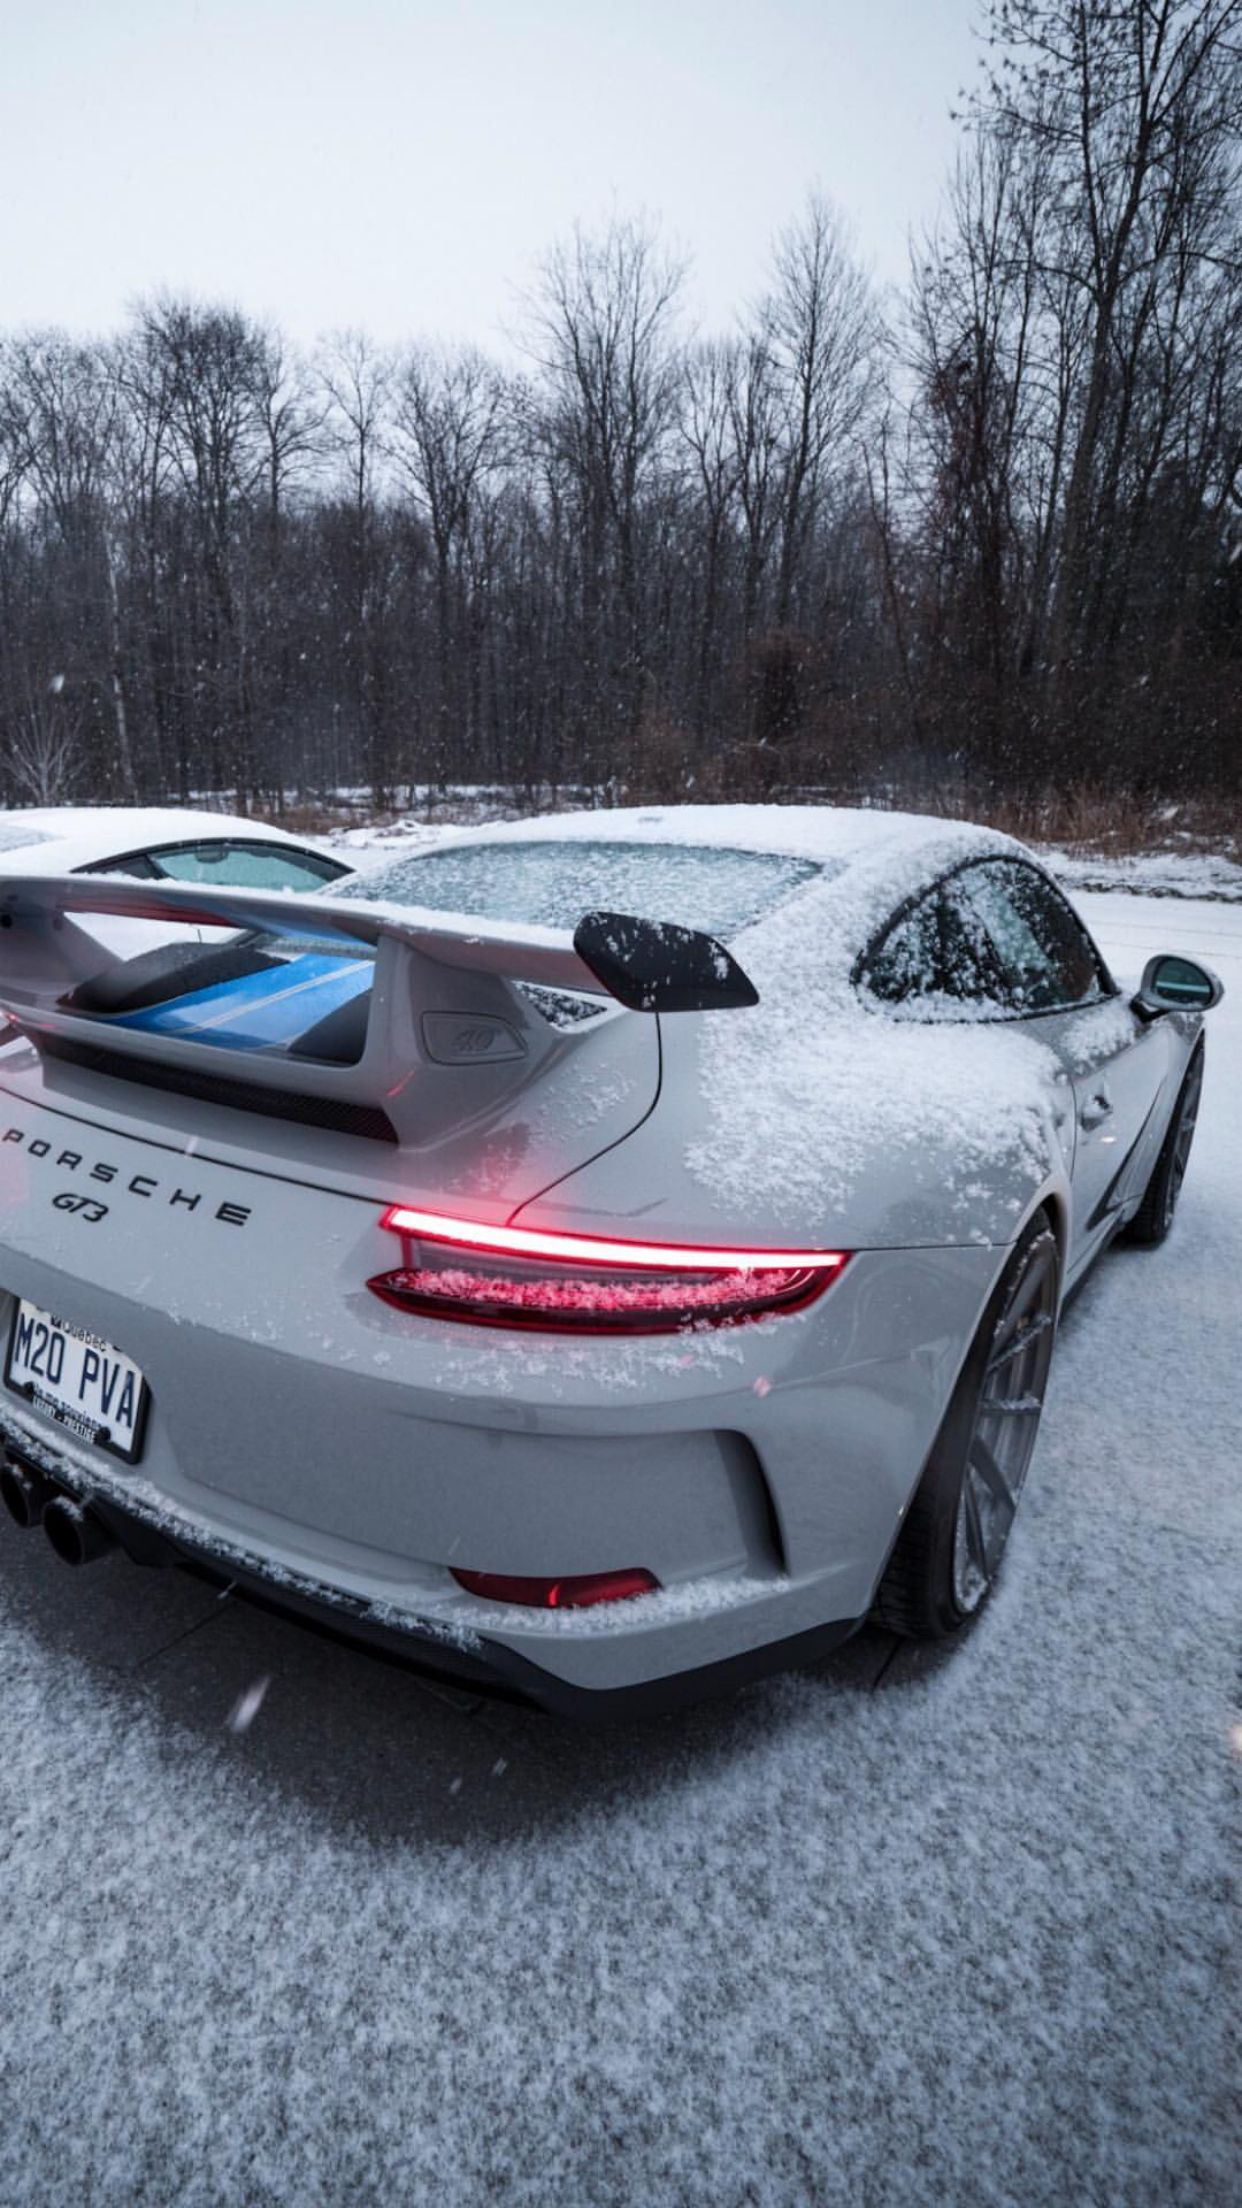 Porsche Porschegt3 Gt3rs Autos Cars Supercars Luxurycars Carlifestyle Sportscars Blacklist Fastcars E Porsche 911 Porsche 911 Gt3